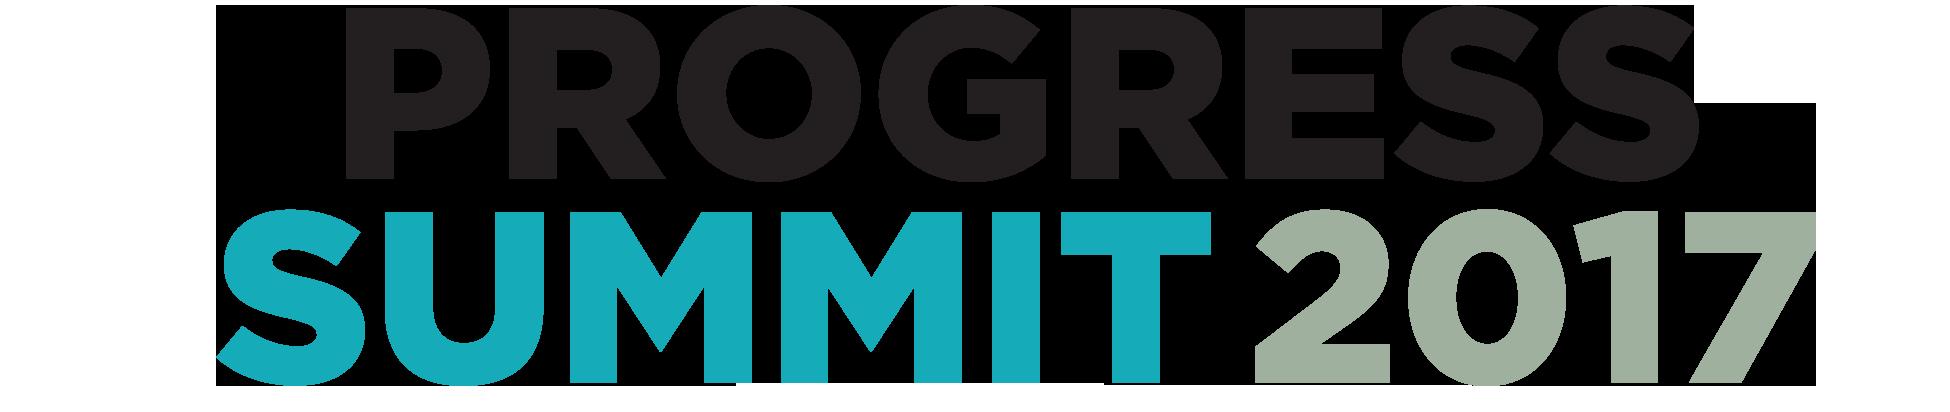 Summit2017-English.png